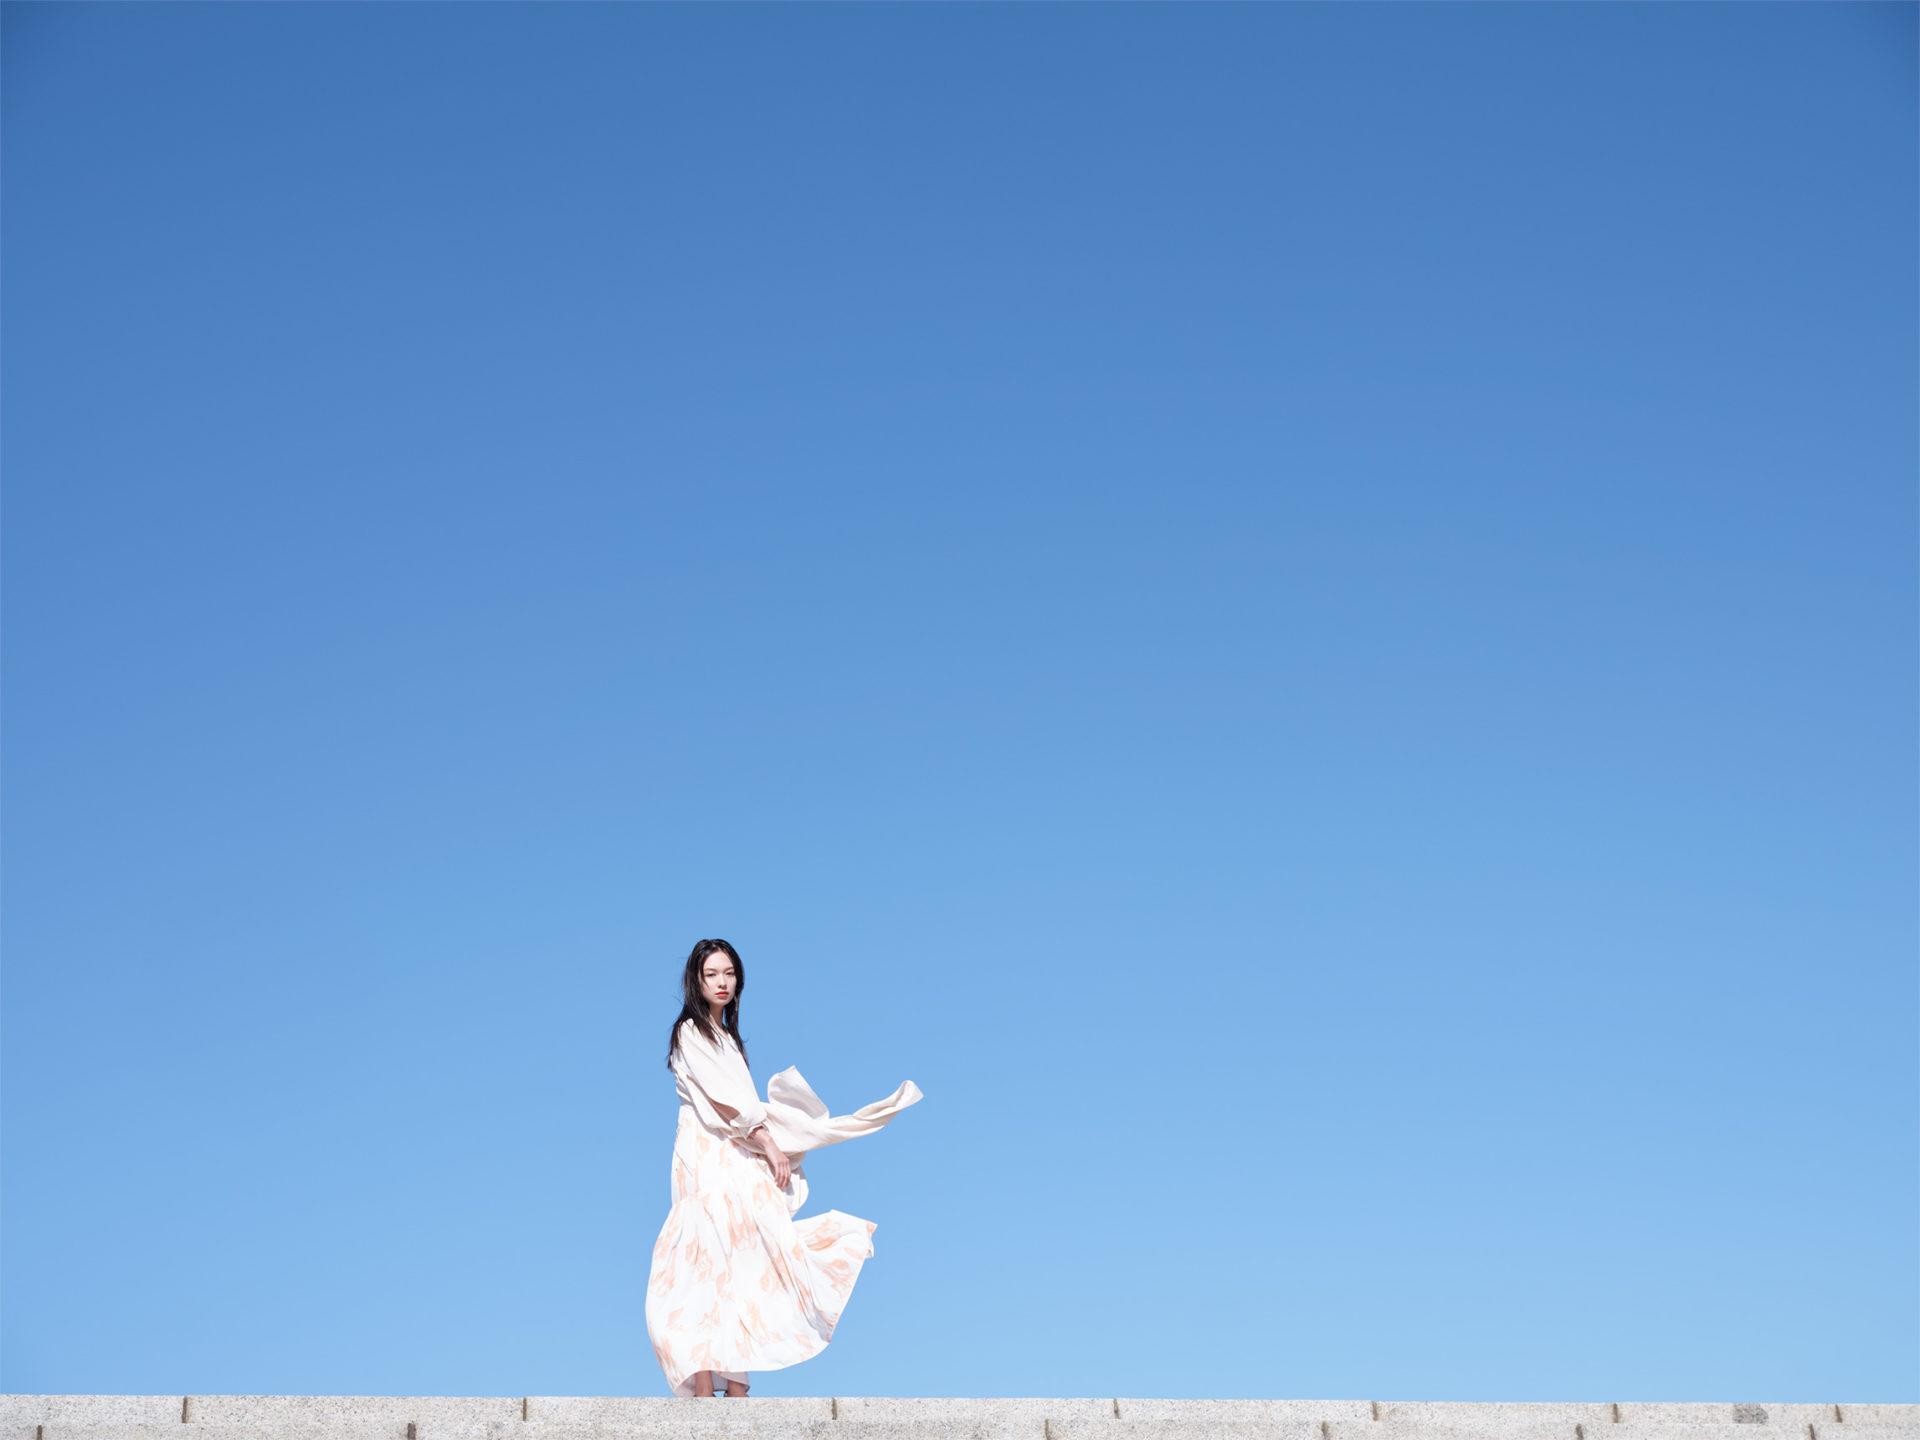 hair&make up tomoko okada stylist netsuki takano model erika mori photographer yuya shimahara